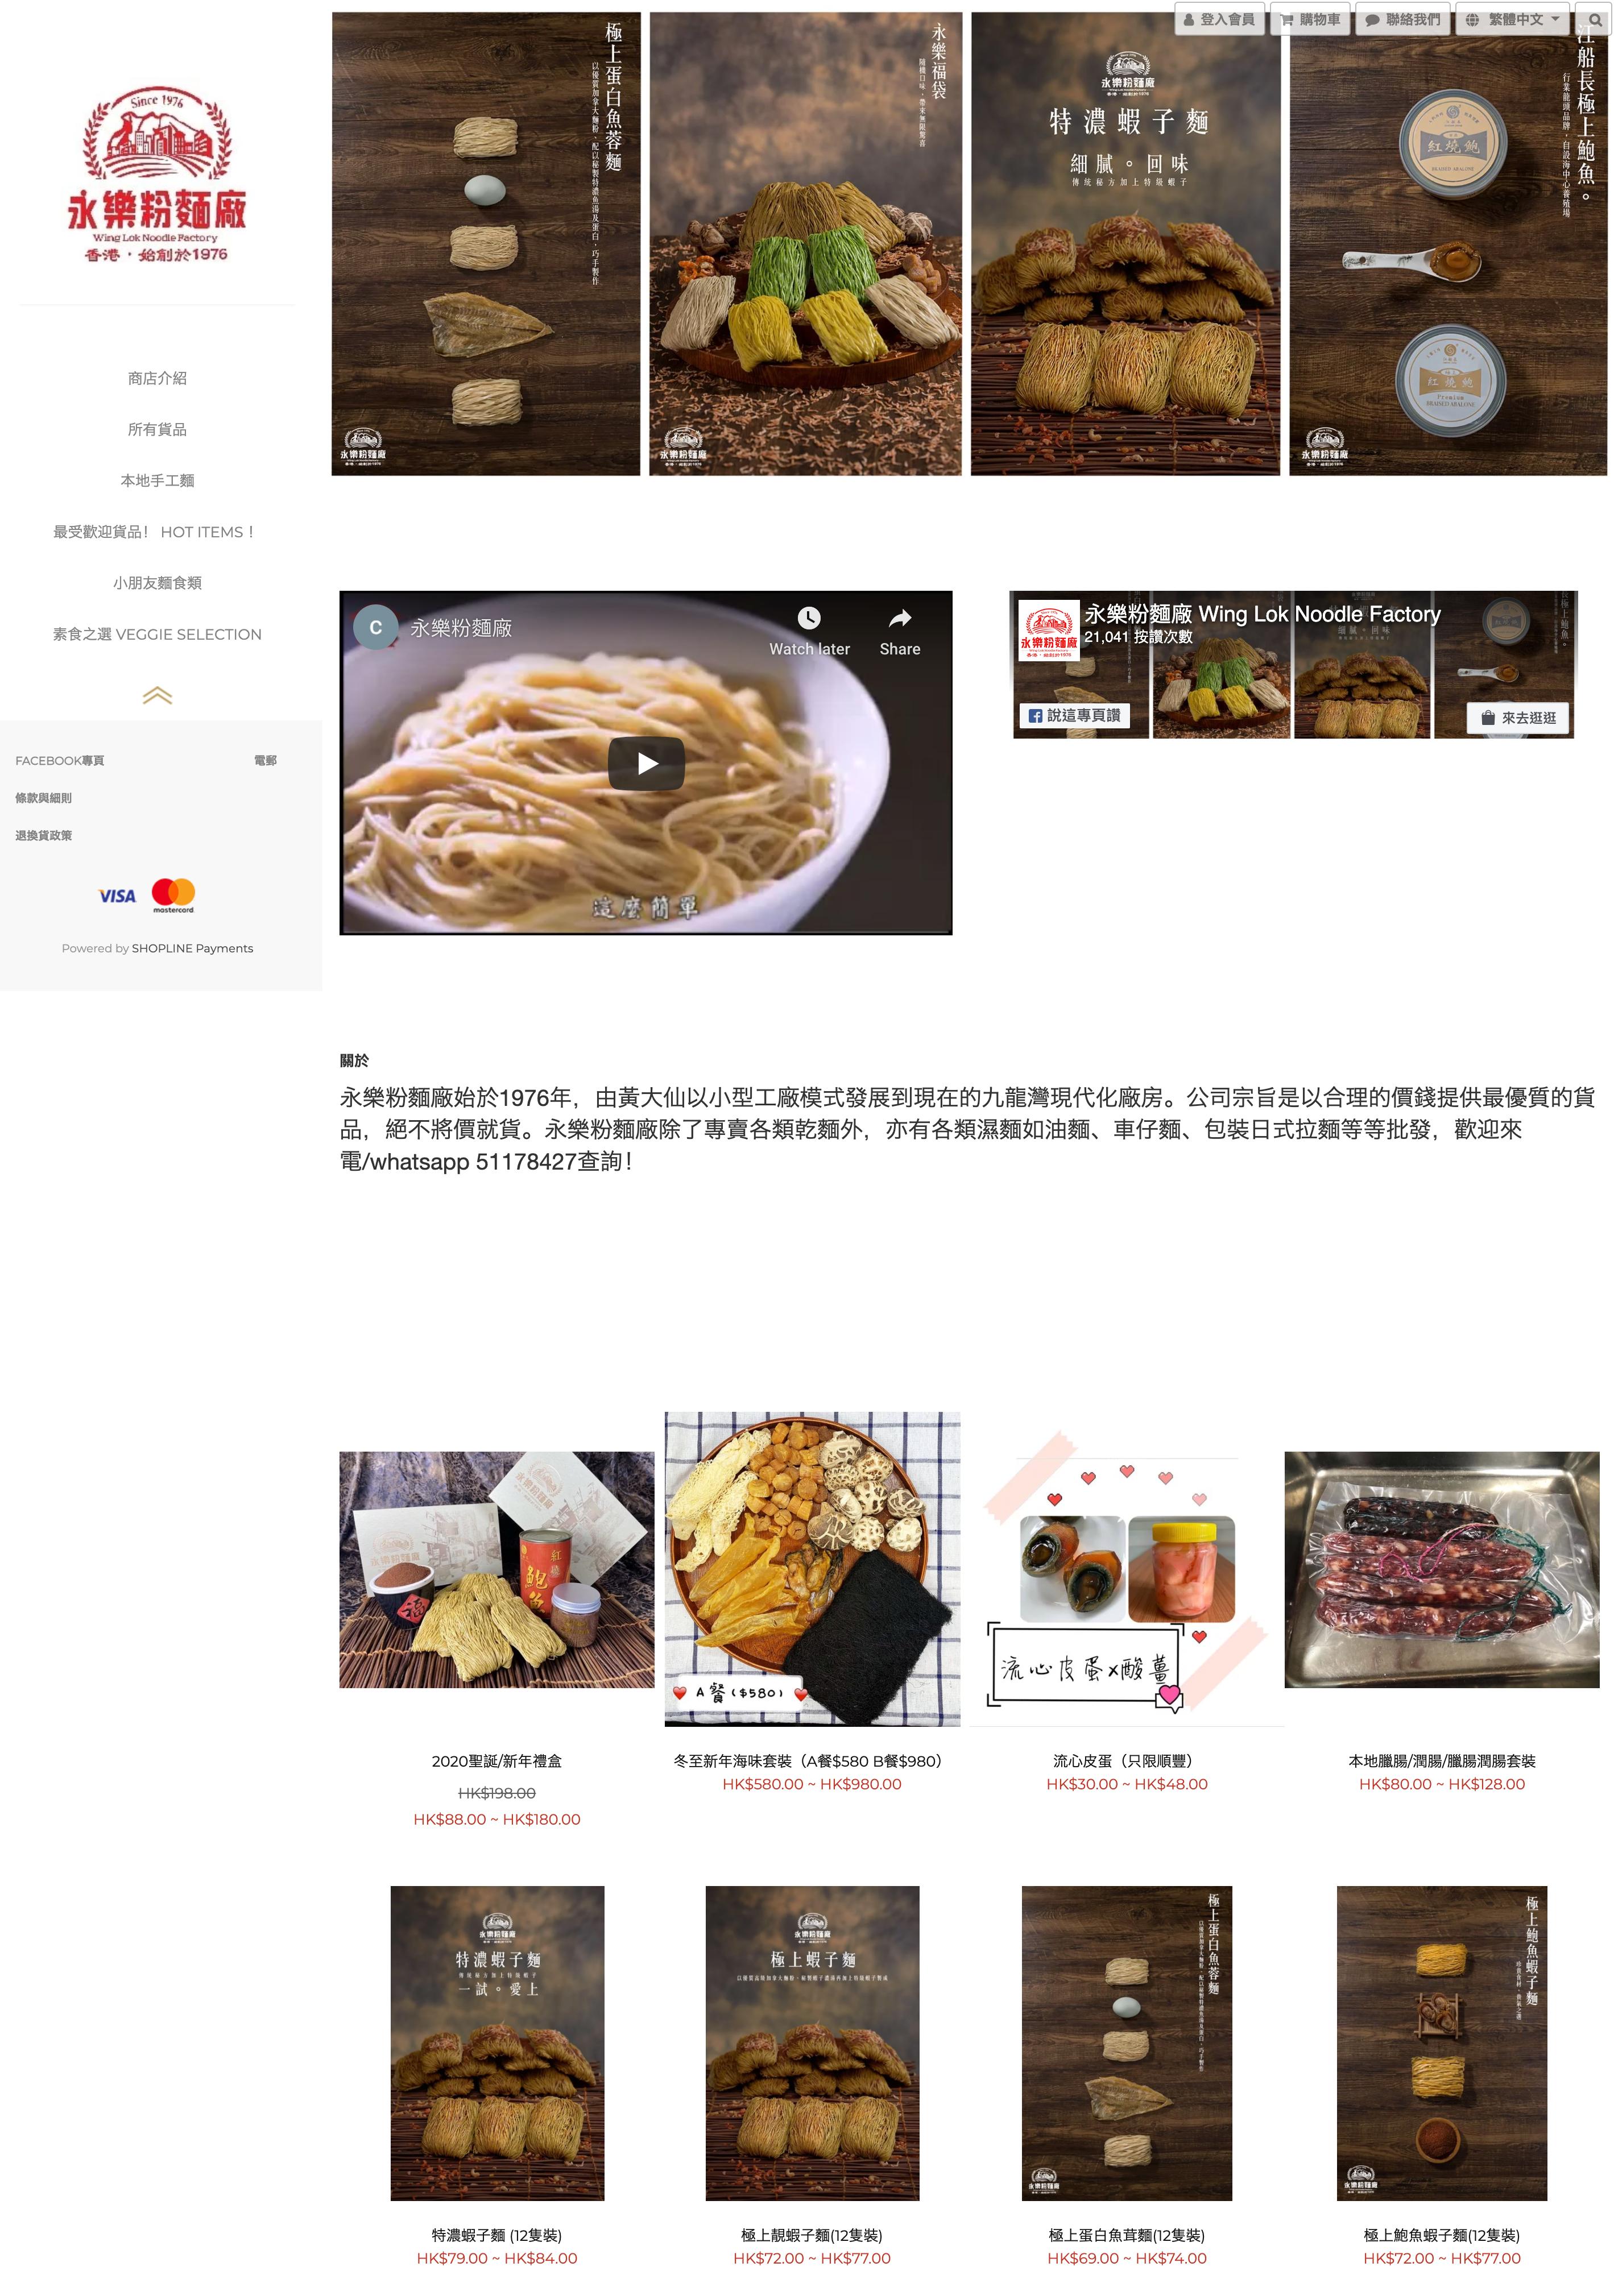 Wing Lok Noodle Factory